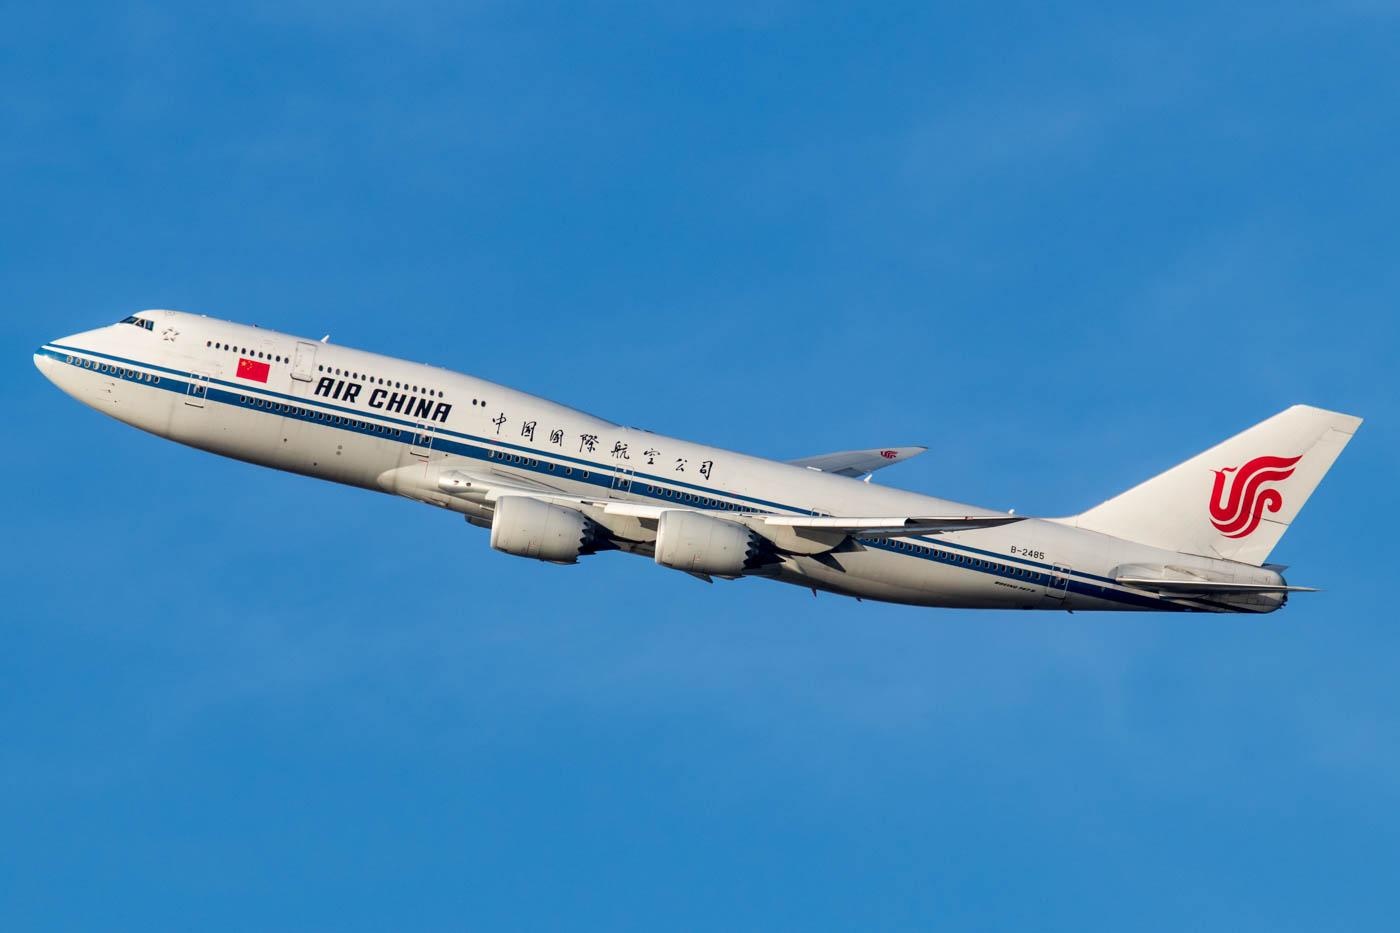 Air China Boeing 747-8 at New York JFK